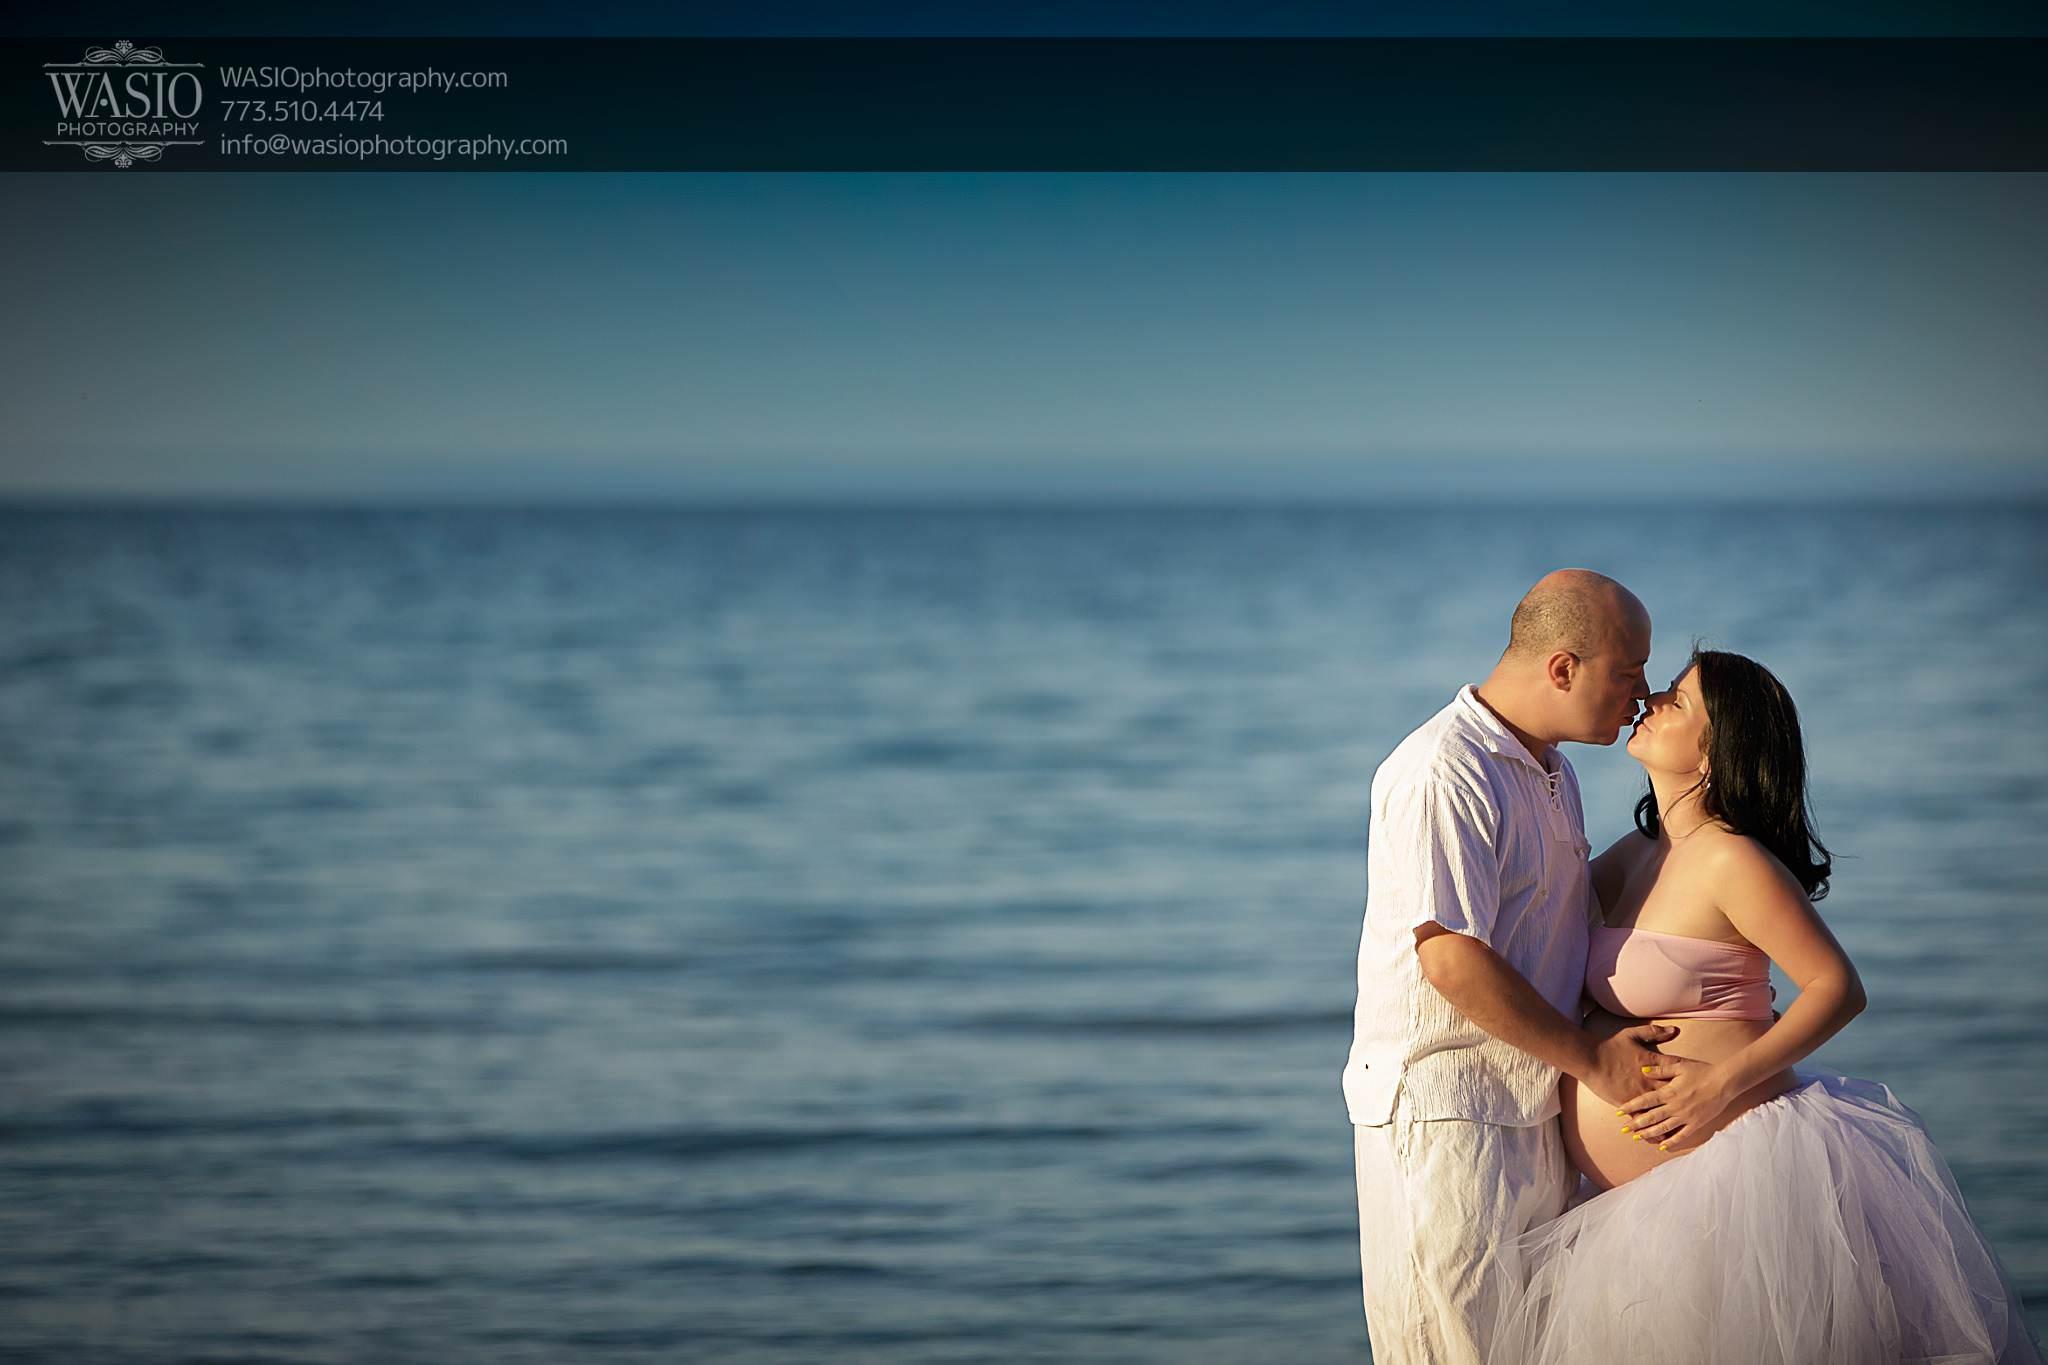 Chicago-maternity-photos-passion-kiss-beach-spring-139 Chicago Maternity Photos - Mayya